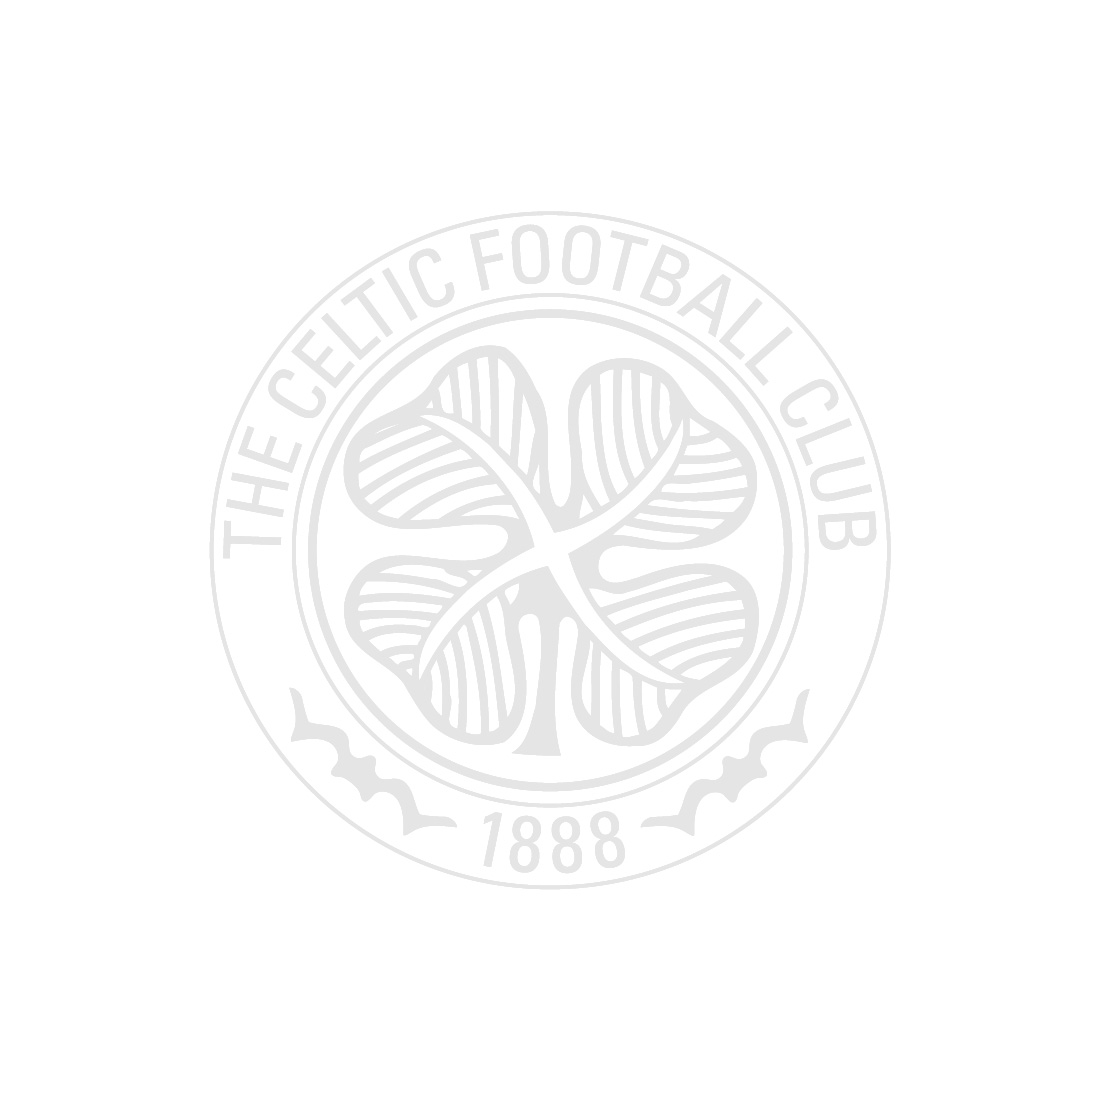 Celtic Hailey Mascot - Small